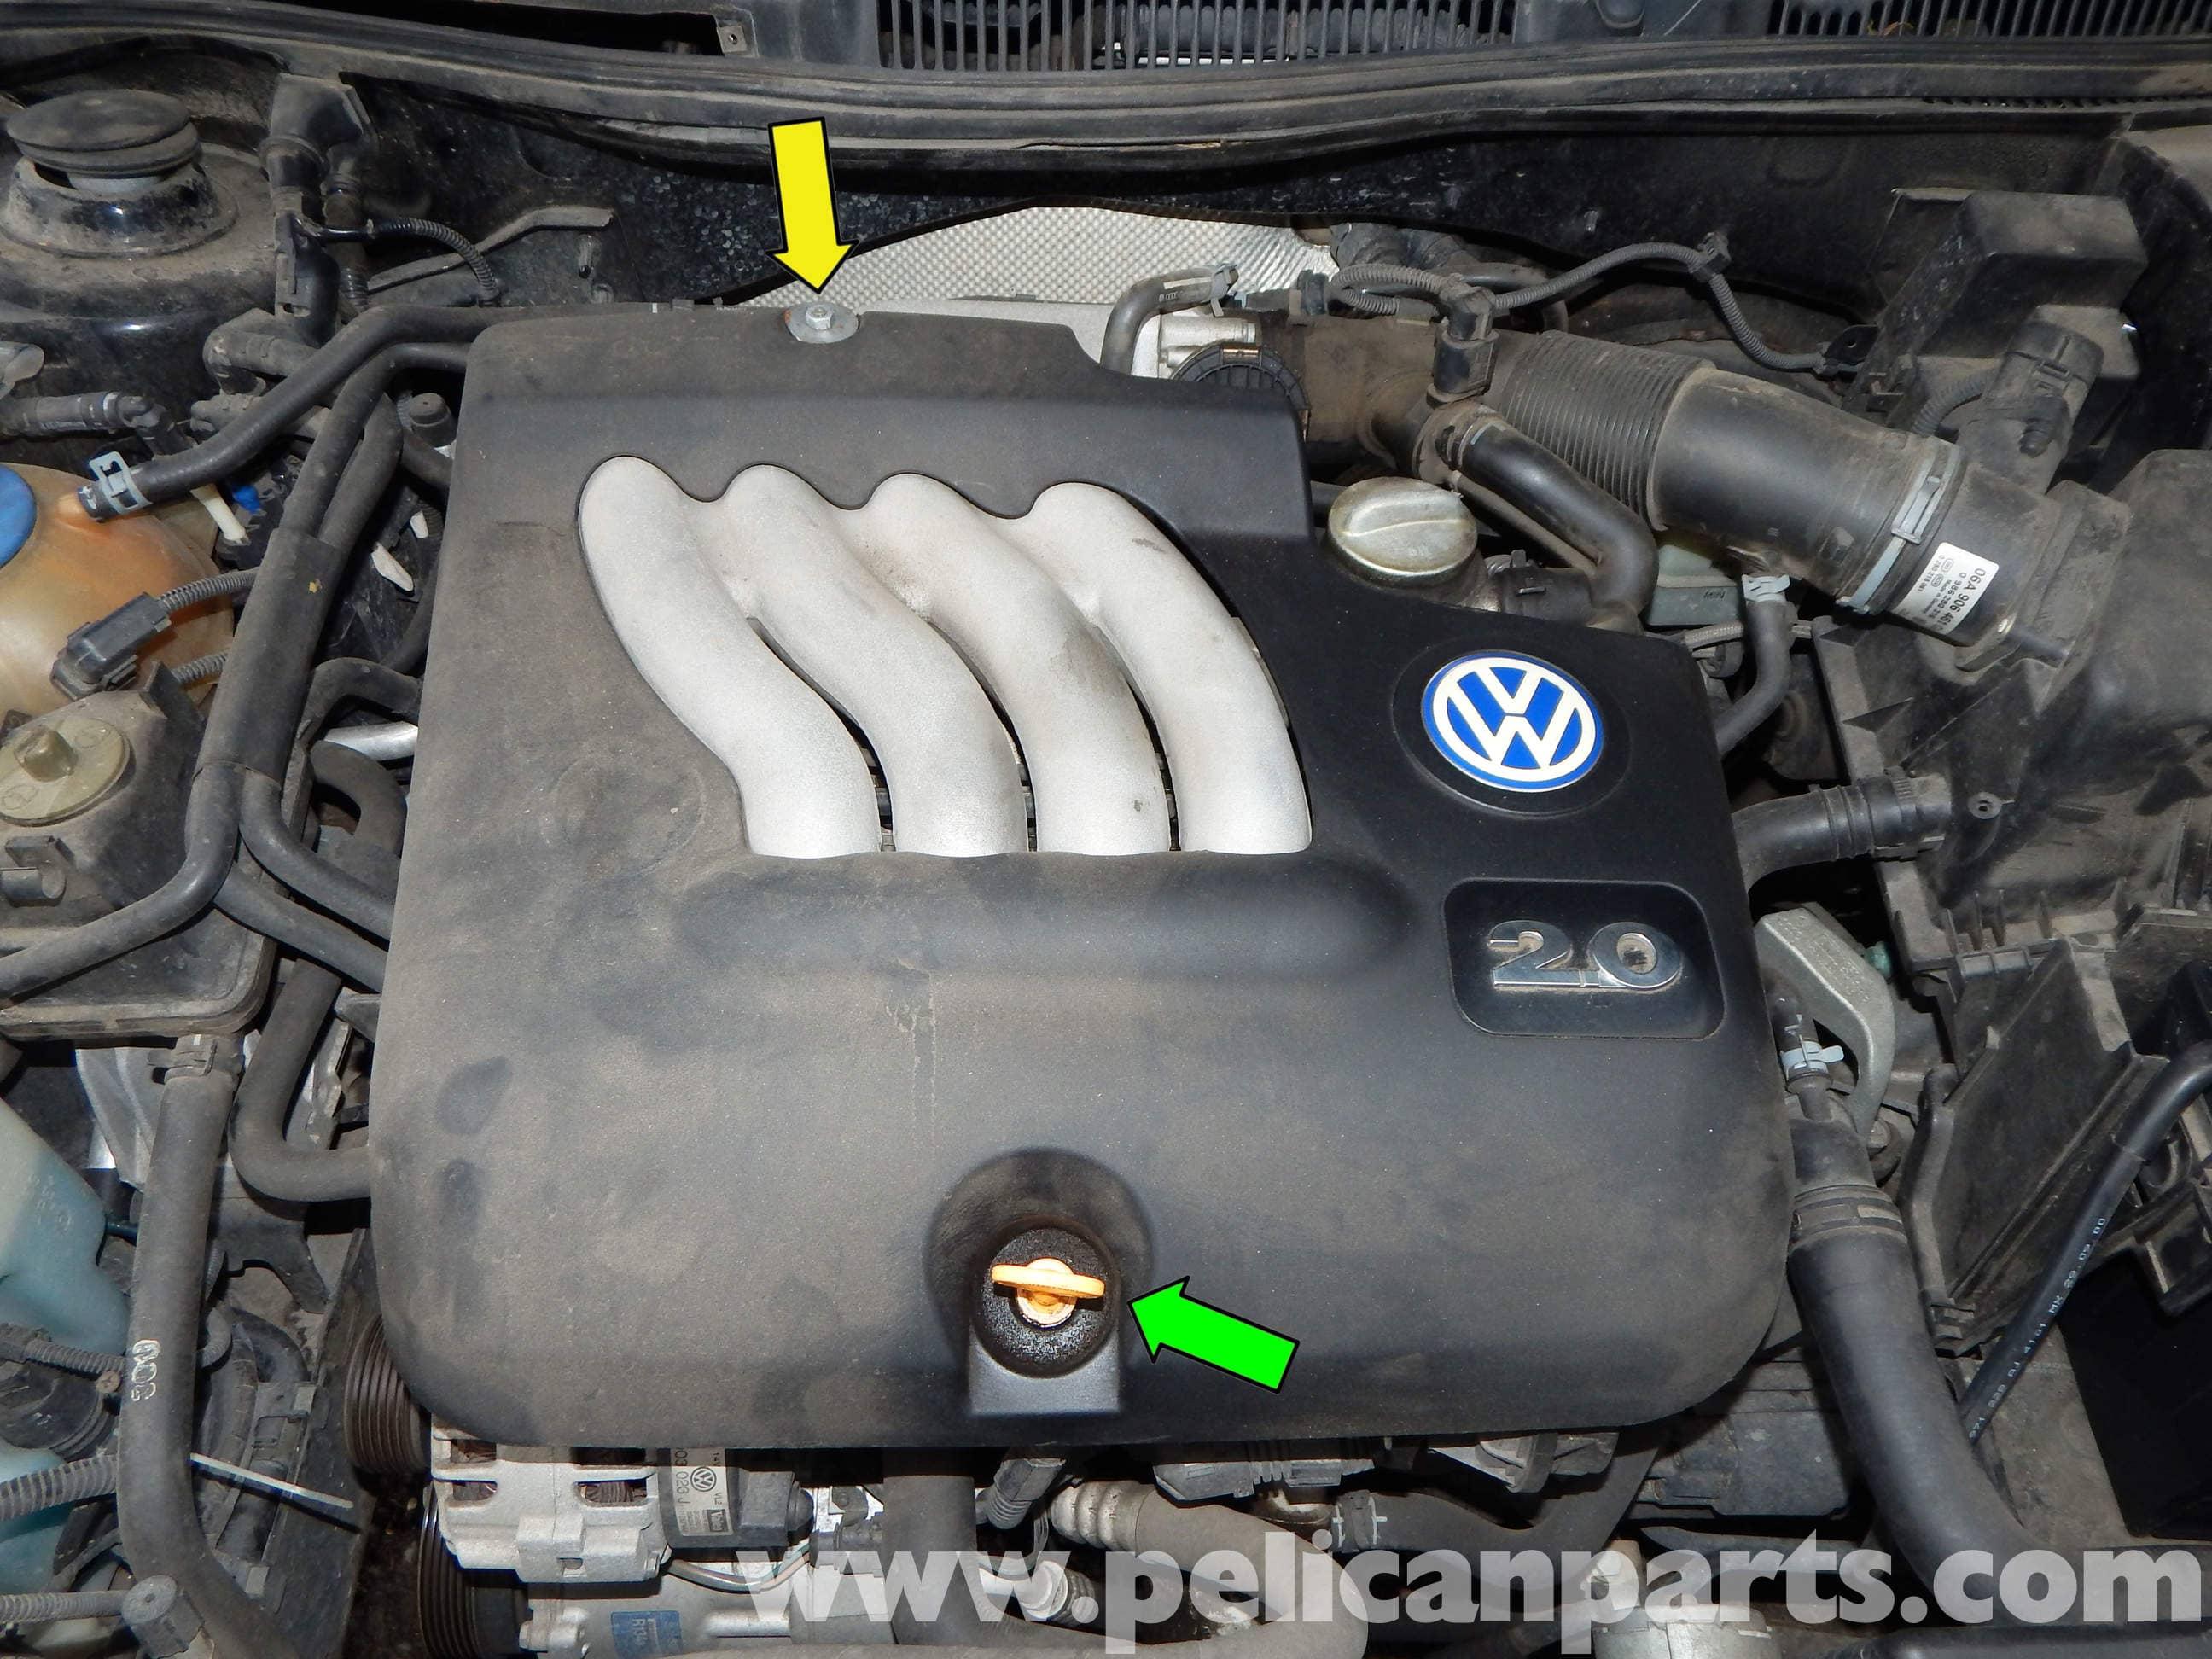 Volkswagen Jetta Mk4 Engine Cover Removal   Jetta Mk4 2.0L (1999-2005)    Pelican Parts DIY Maintenance ArticlePelican Parts